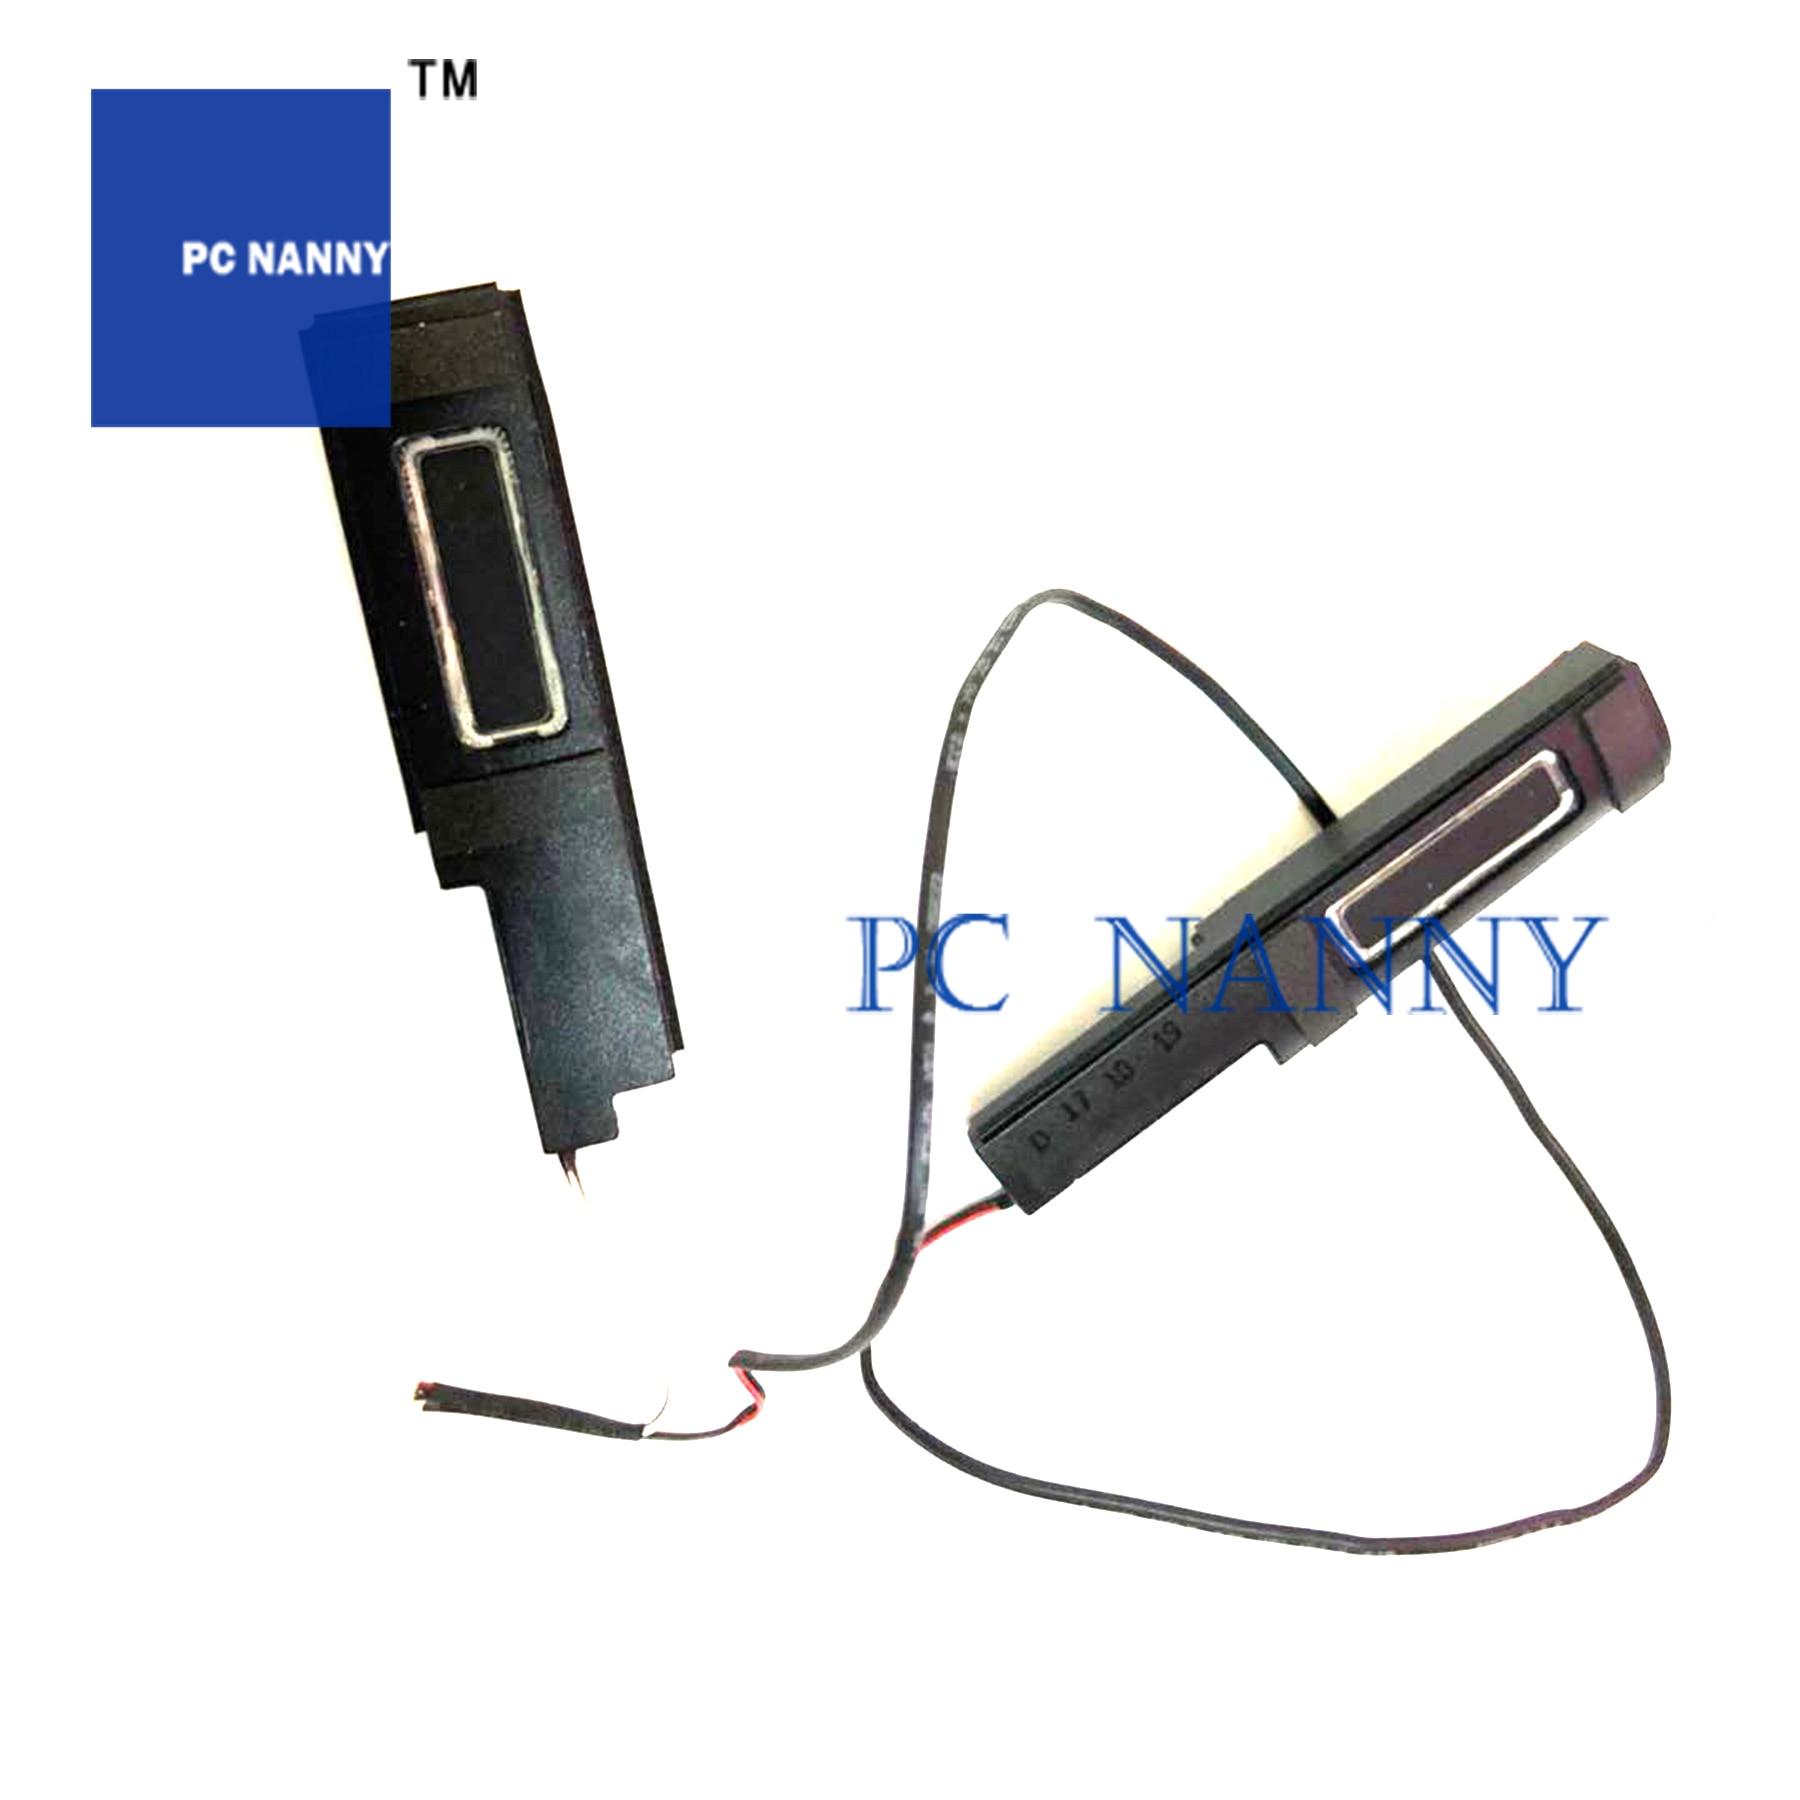 PCNANNY para HP ENVY 13-ad, panel táctil para ratón 920-003591-01 altavoces